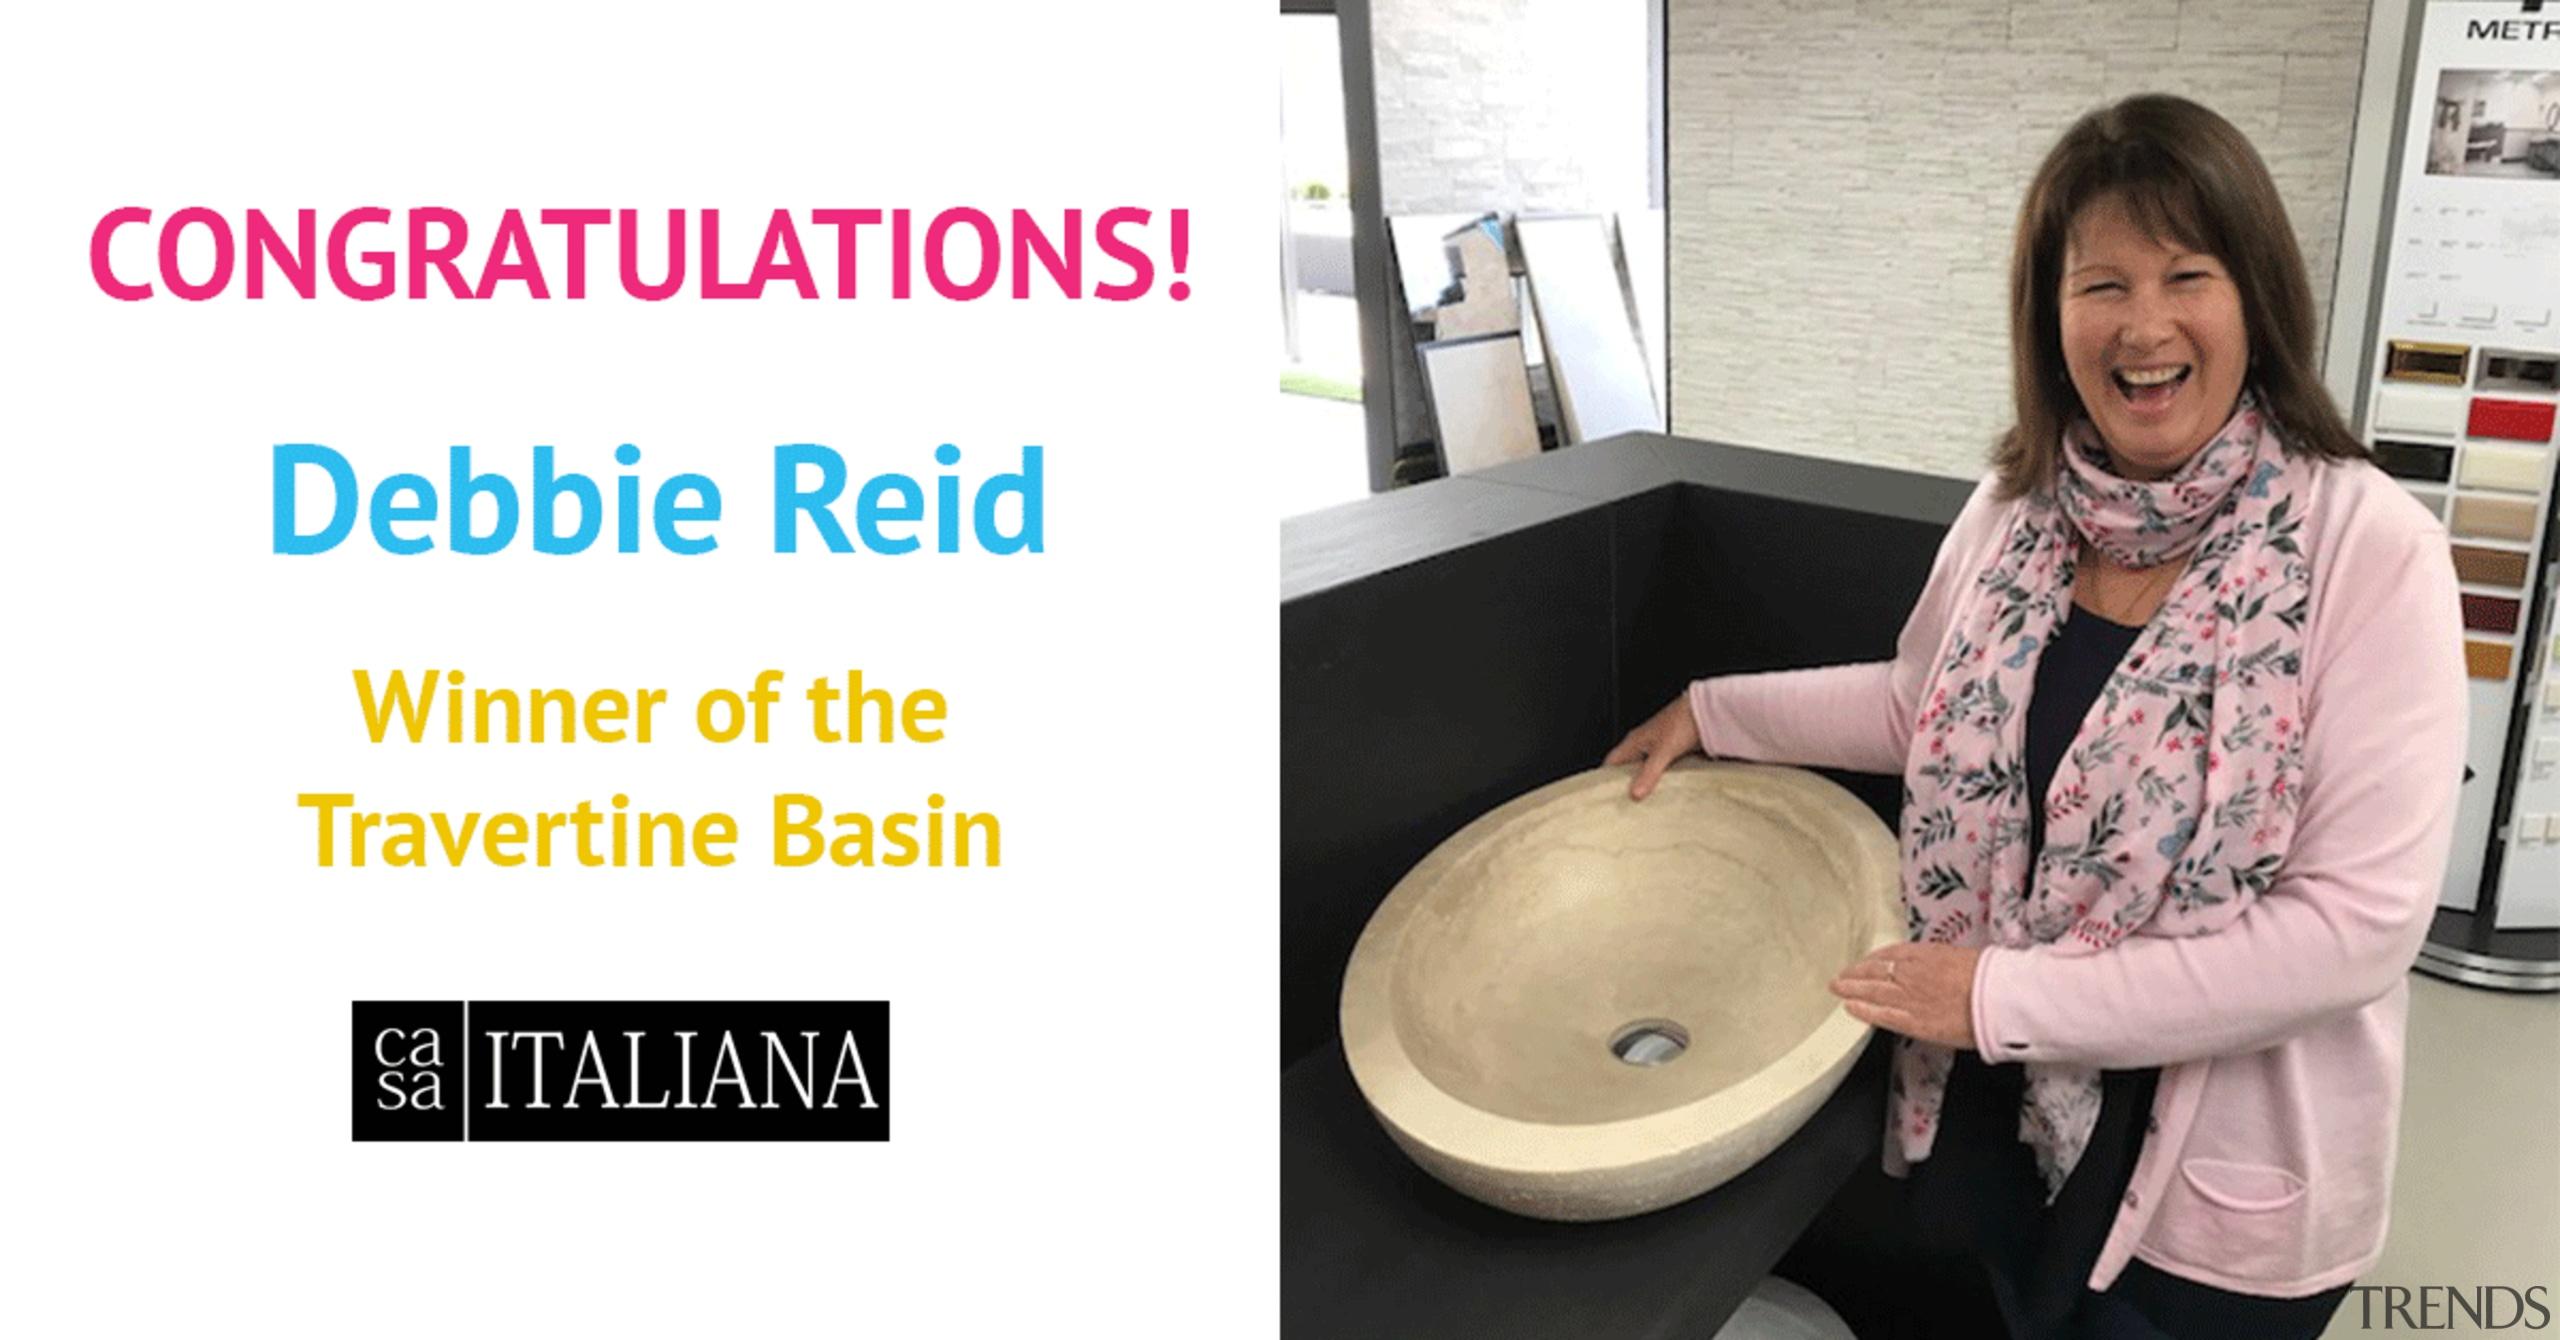 Debbie Reid with her fabulous prize! - Debbie product, white